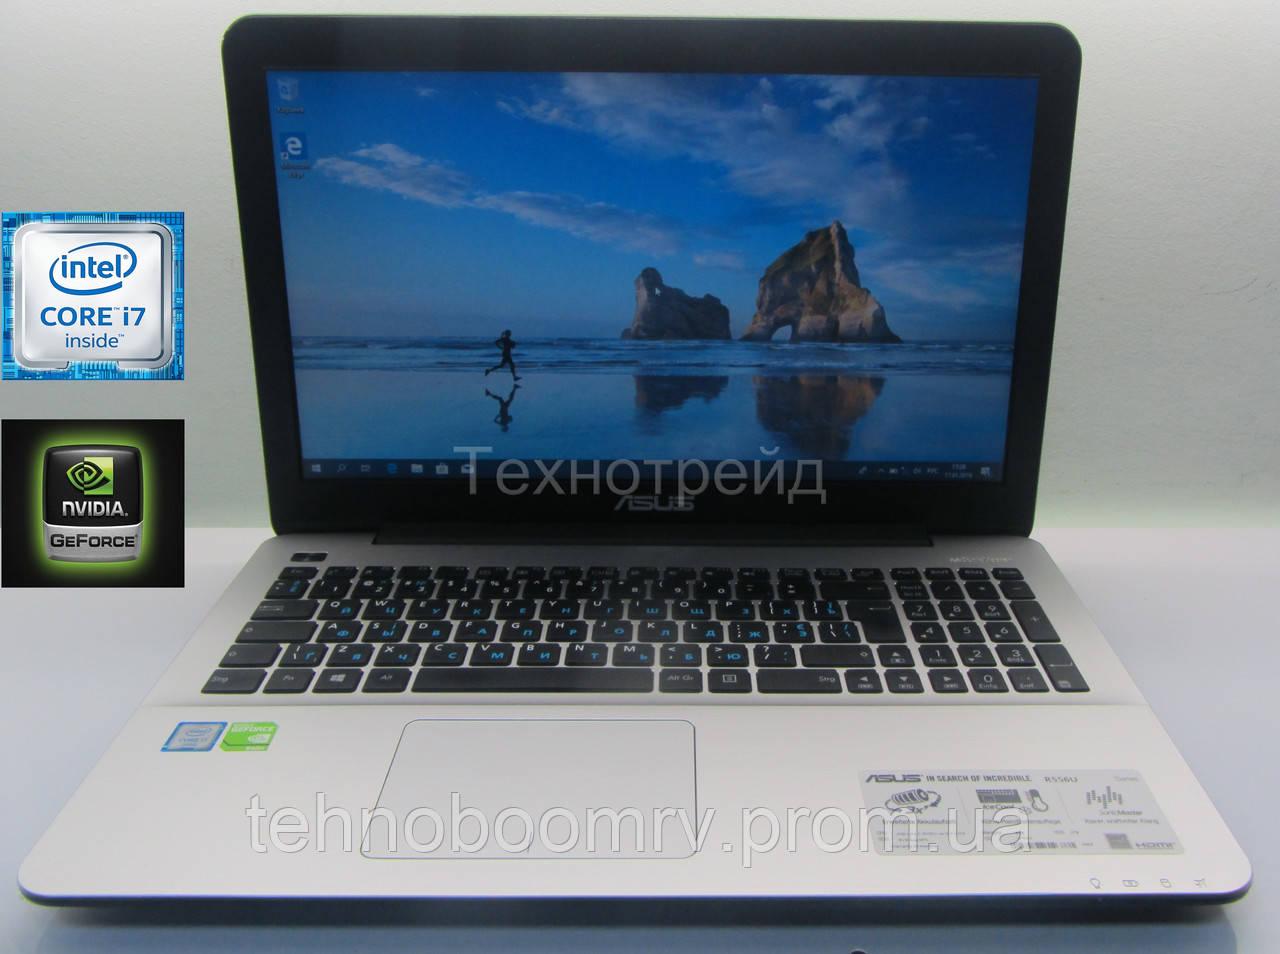 Asus R556U - Intel i7-6500U 3.1GHz/DDR3 8GB/nVidia GT 940M 2GB